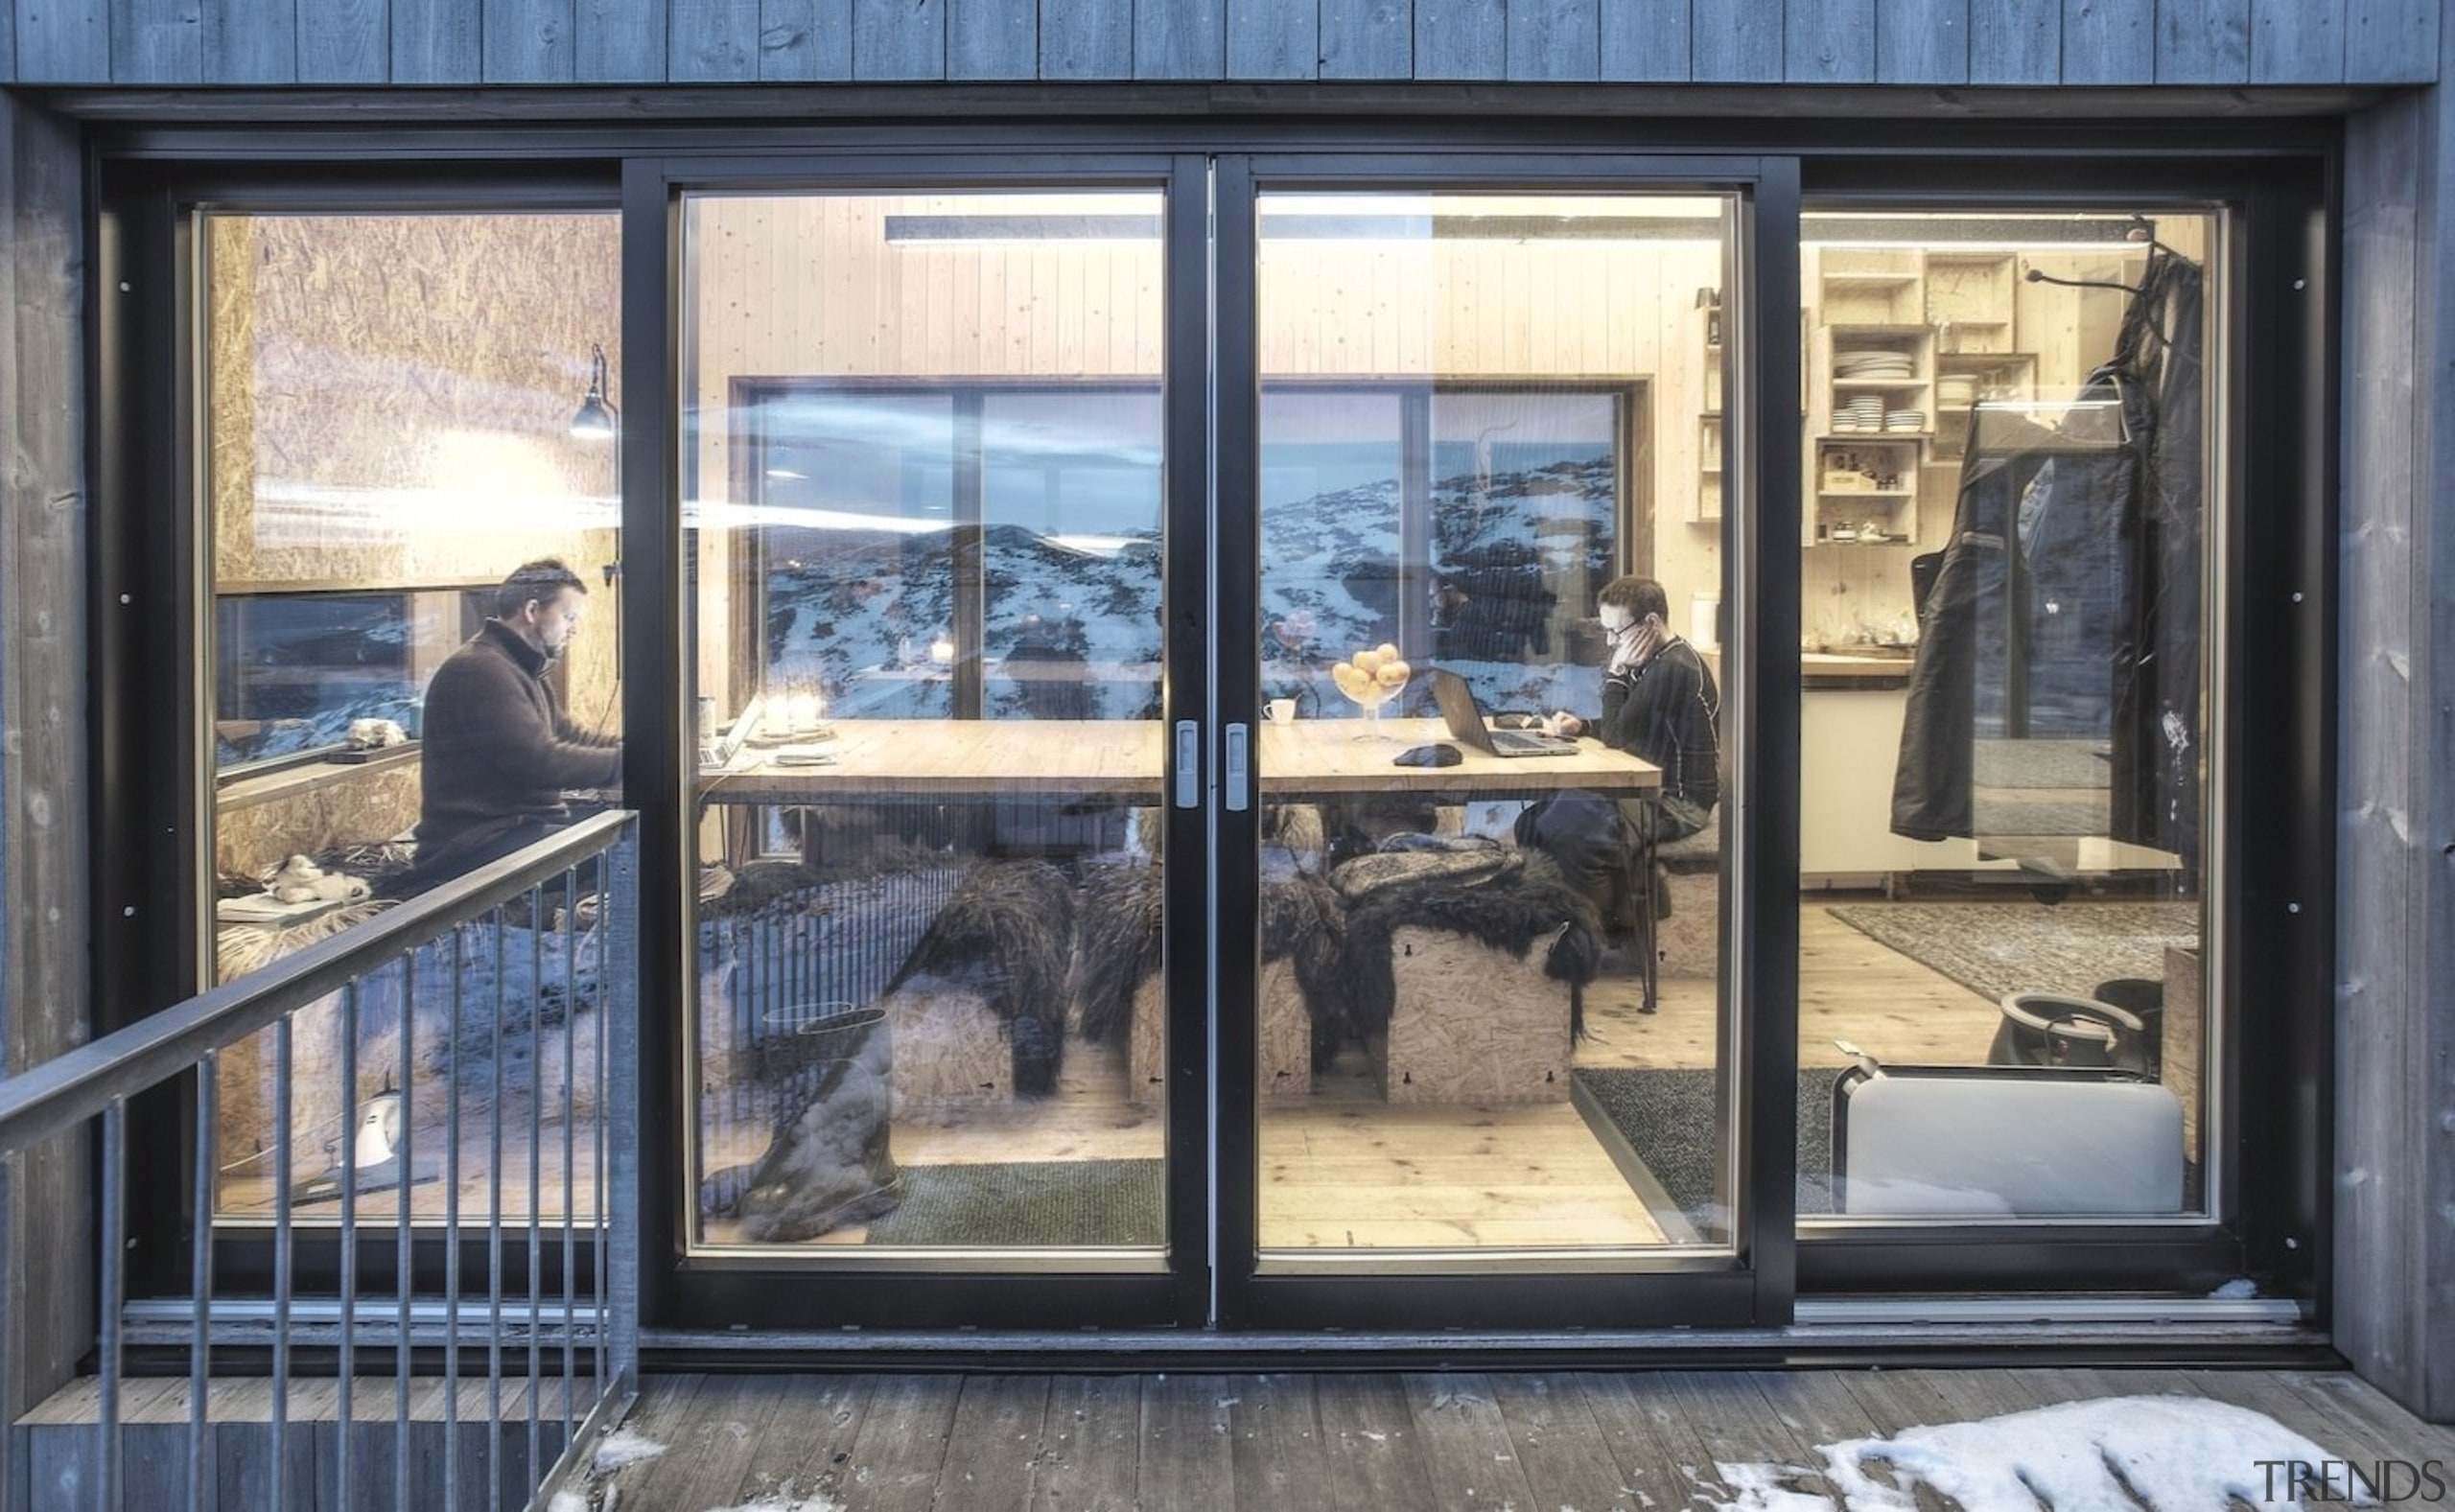 Architect: TYIN tegnestue ArchitectsPhotographer: Pasi Aalto / door, glass, home, window, gray, black